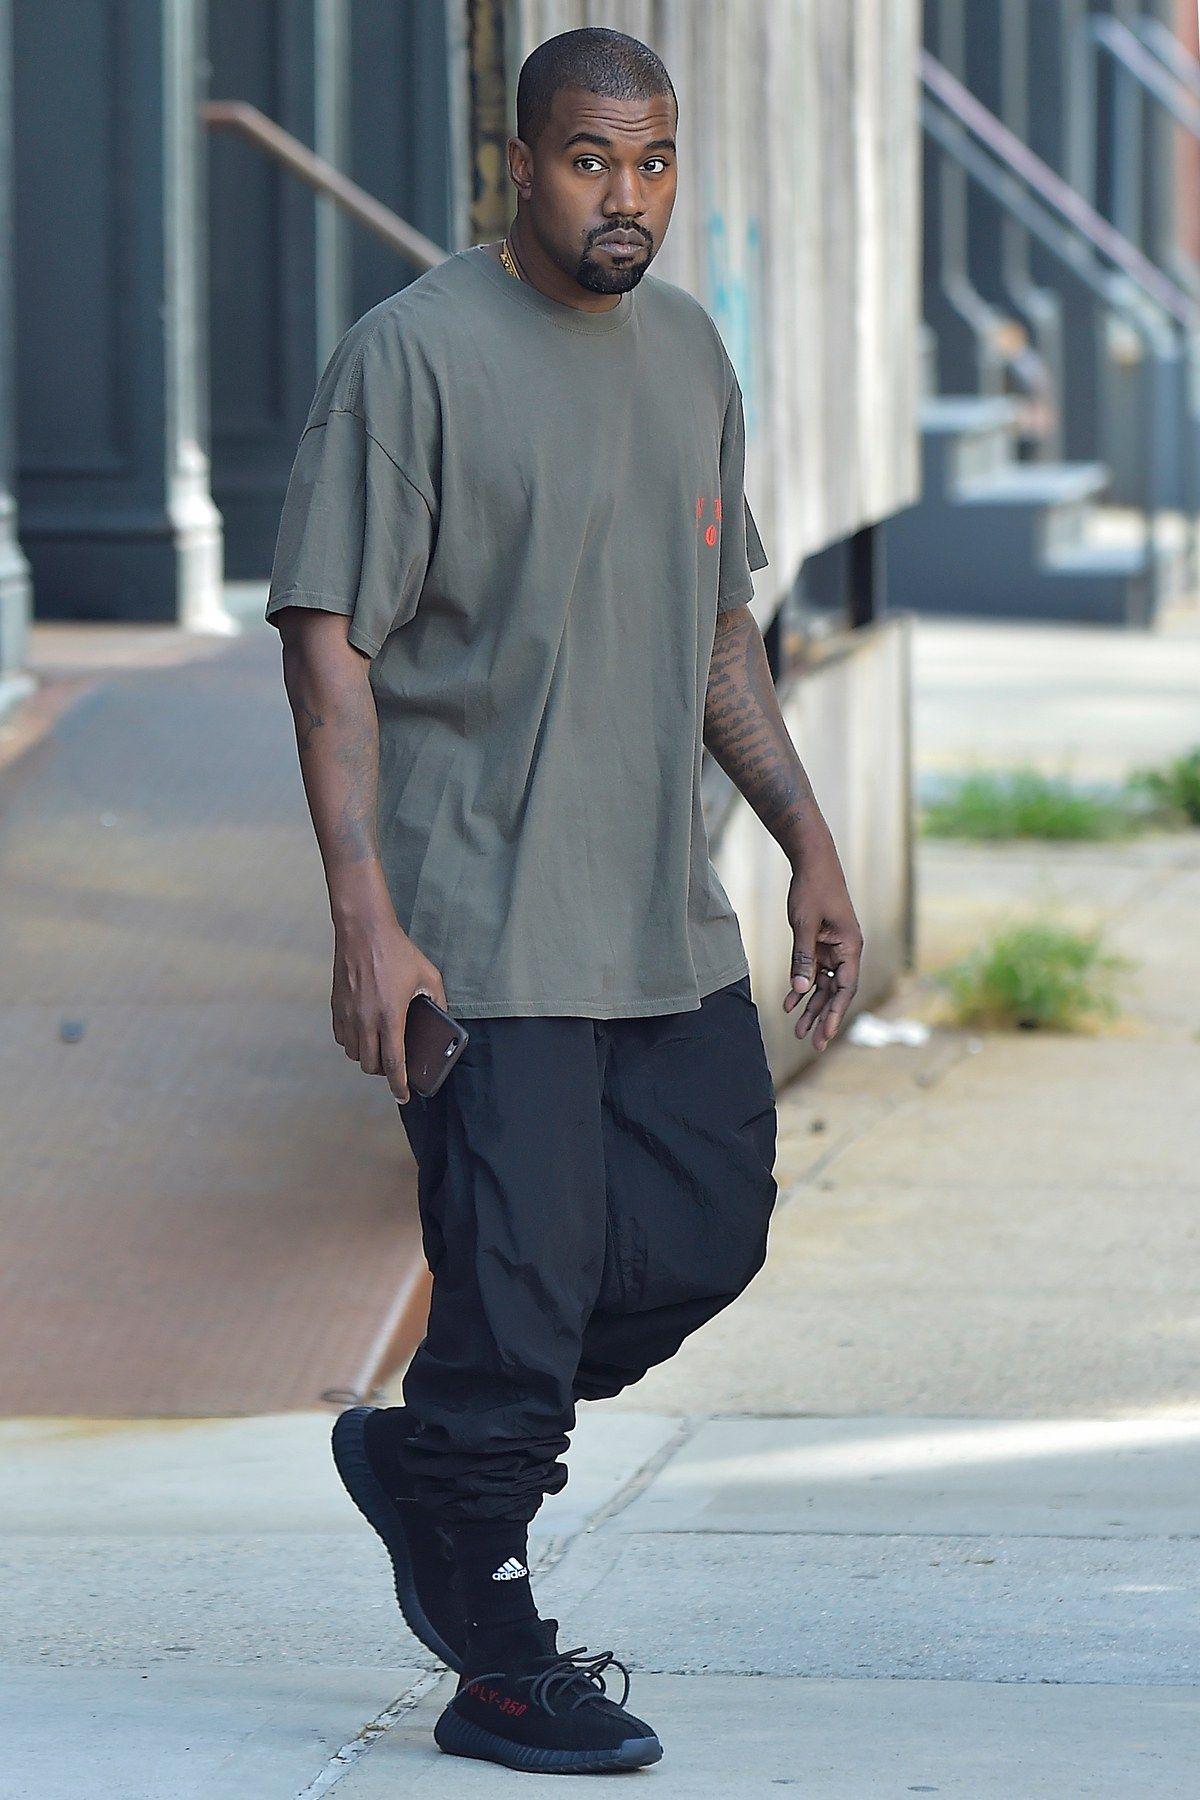 The Kanye West Look Book Gq Kanye West Outfits Kanye West Style Kanye Fashion